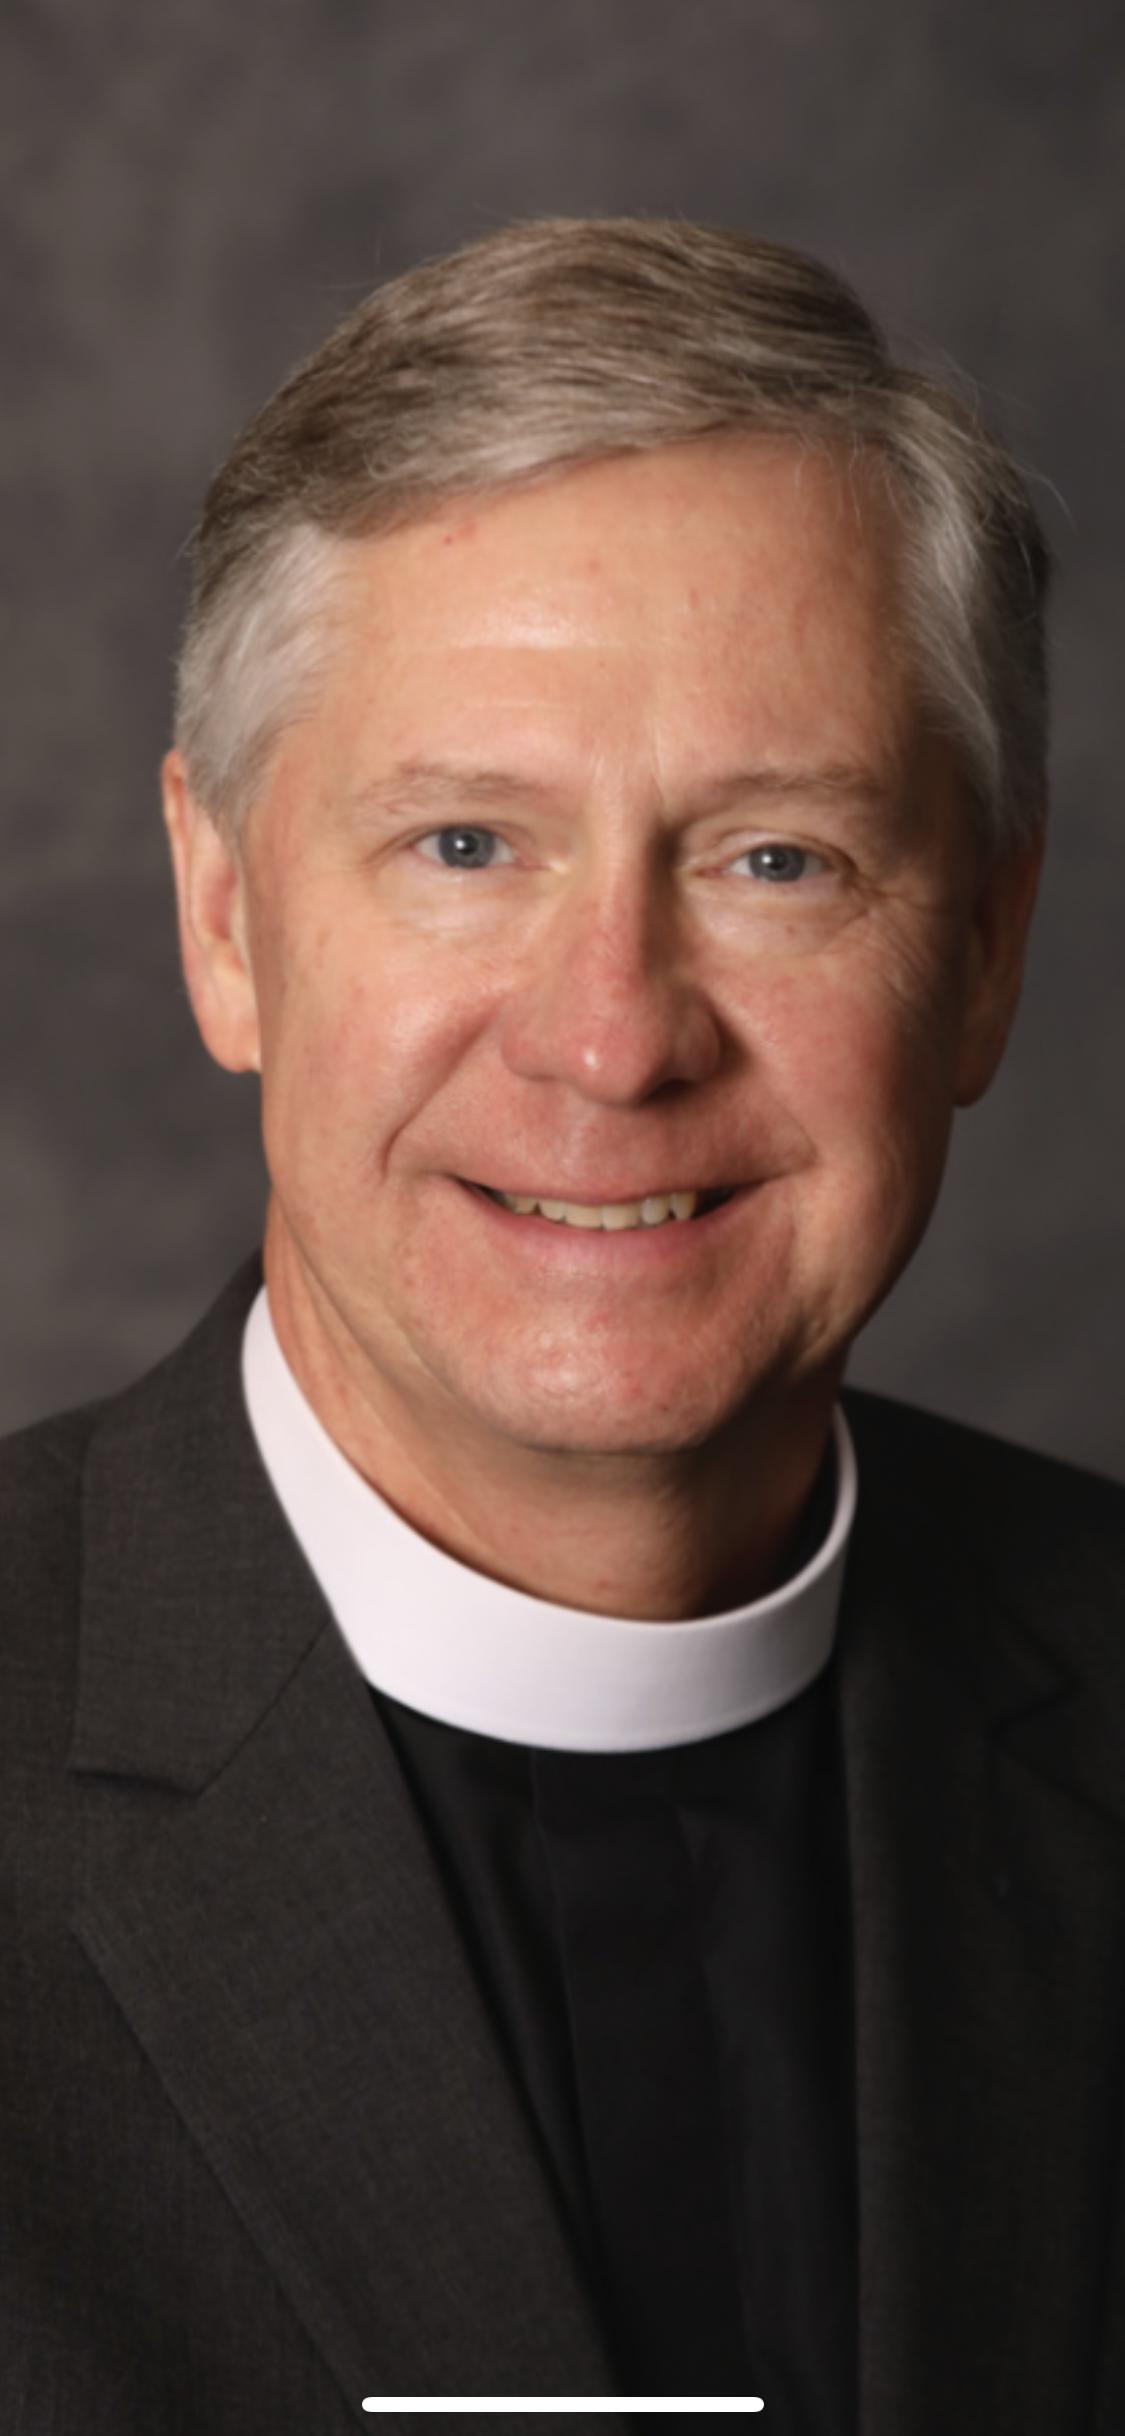 The Rev. David Hodges